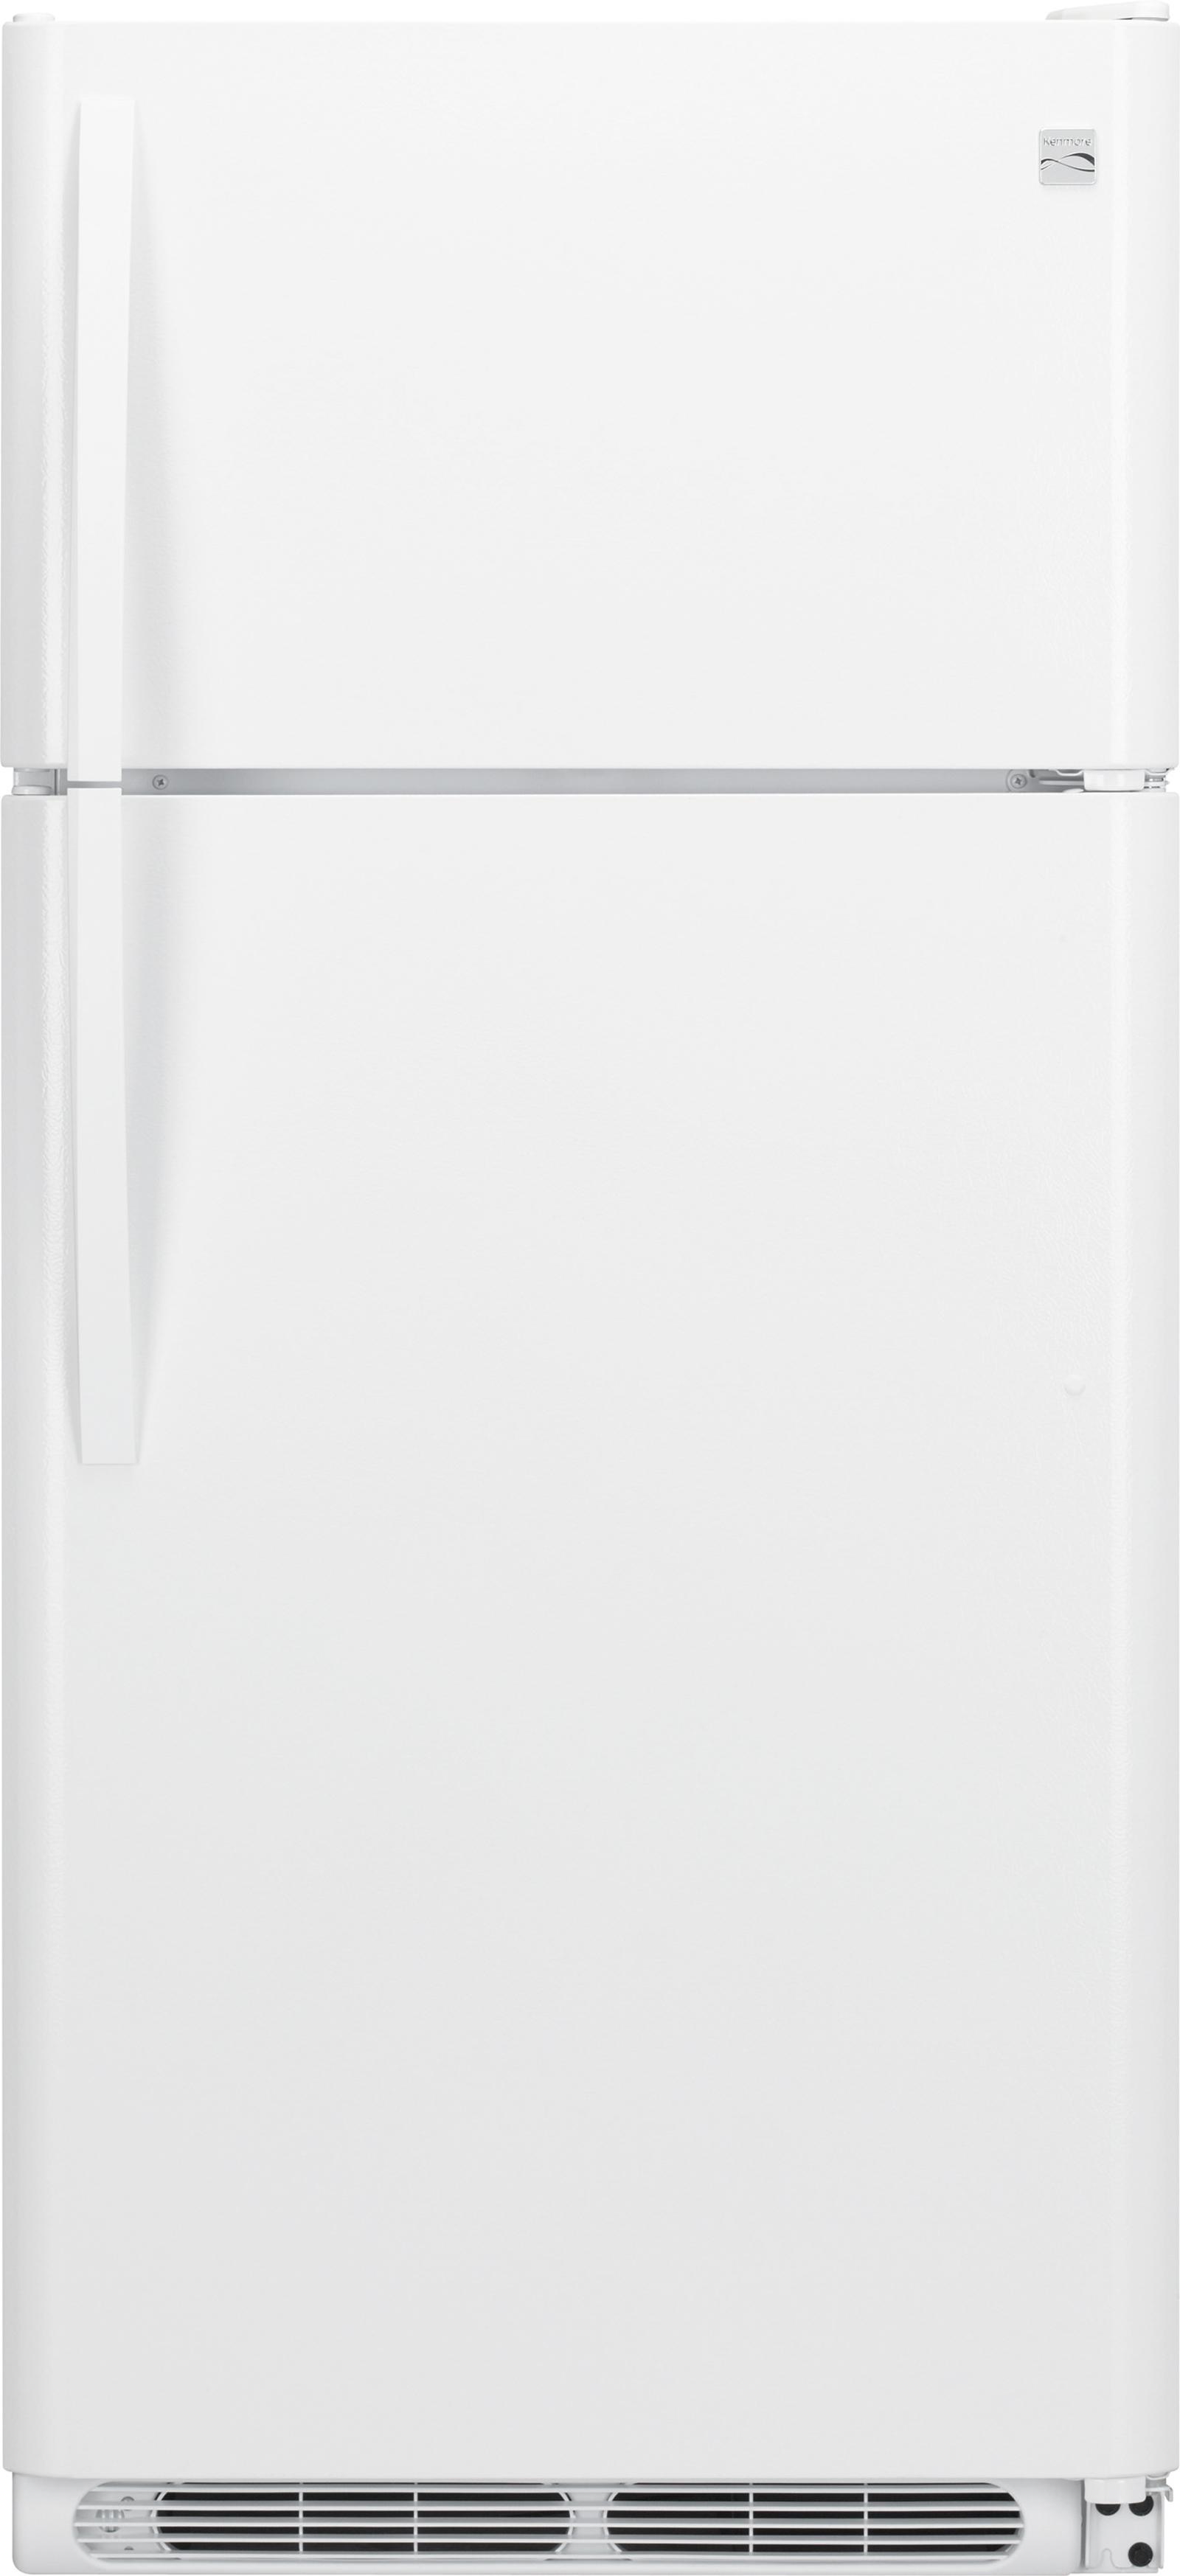 Kenmore 20.4 cu. ft. Top Freezer Refrigerator - White